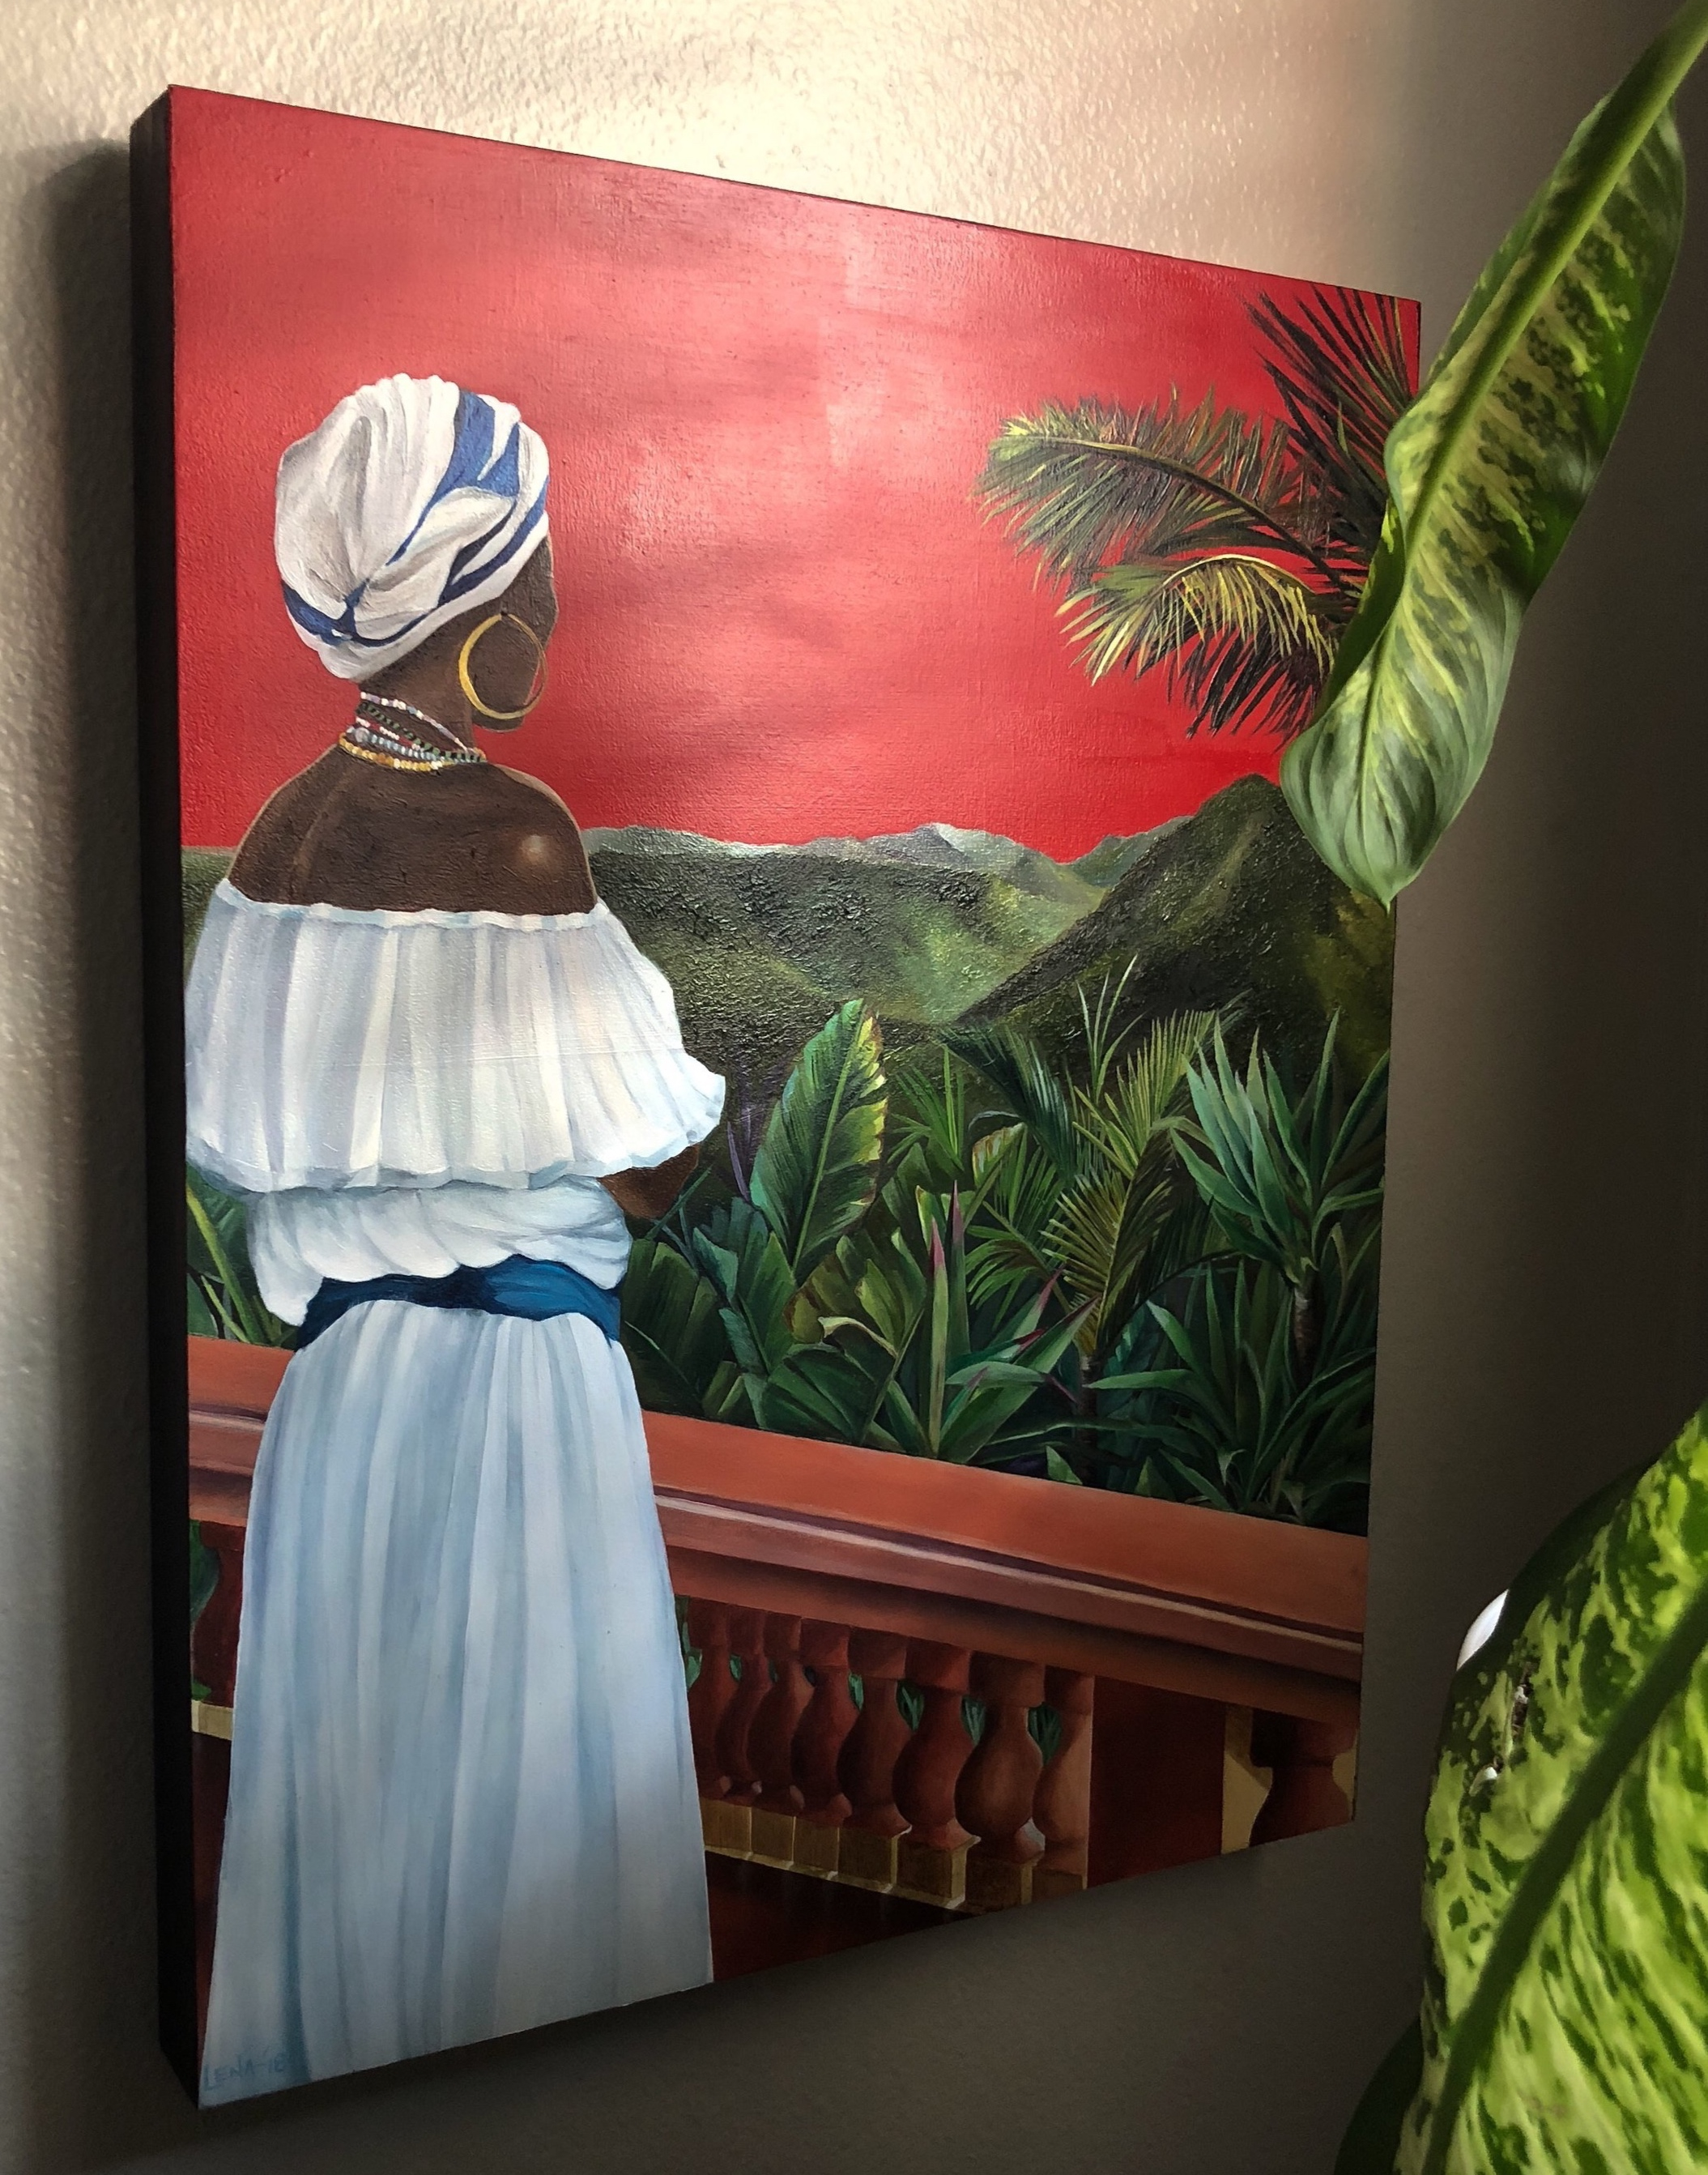 Puerto+Rican+Art+_+Raices+_+2019.jpg